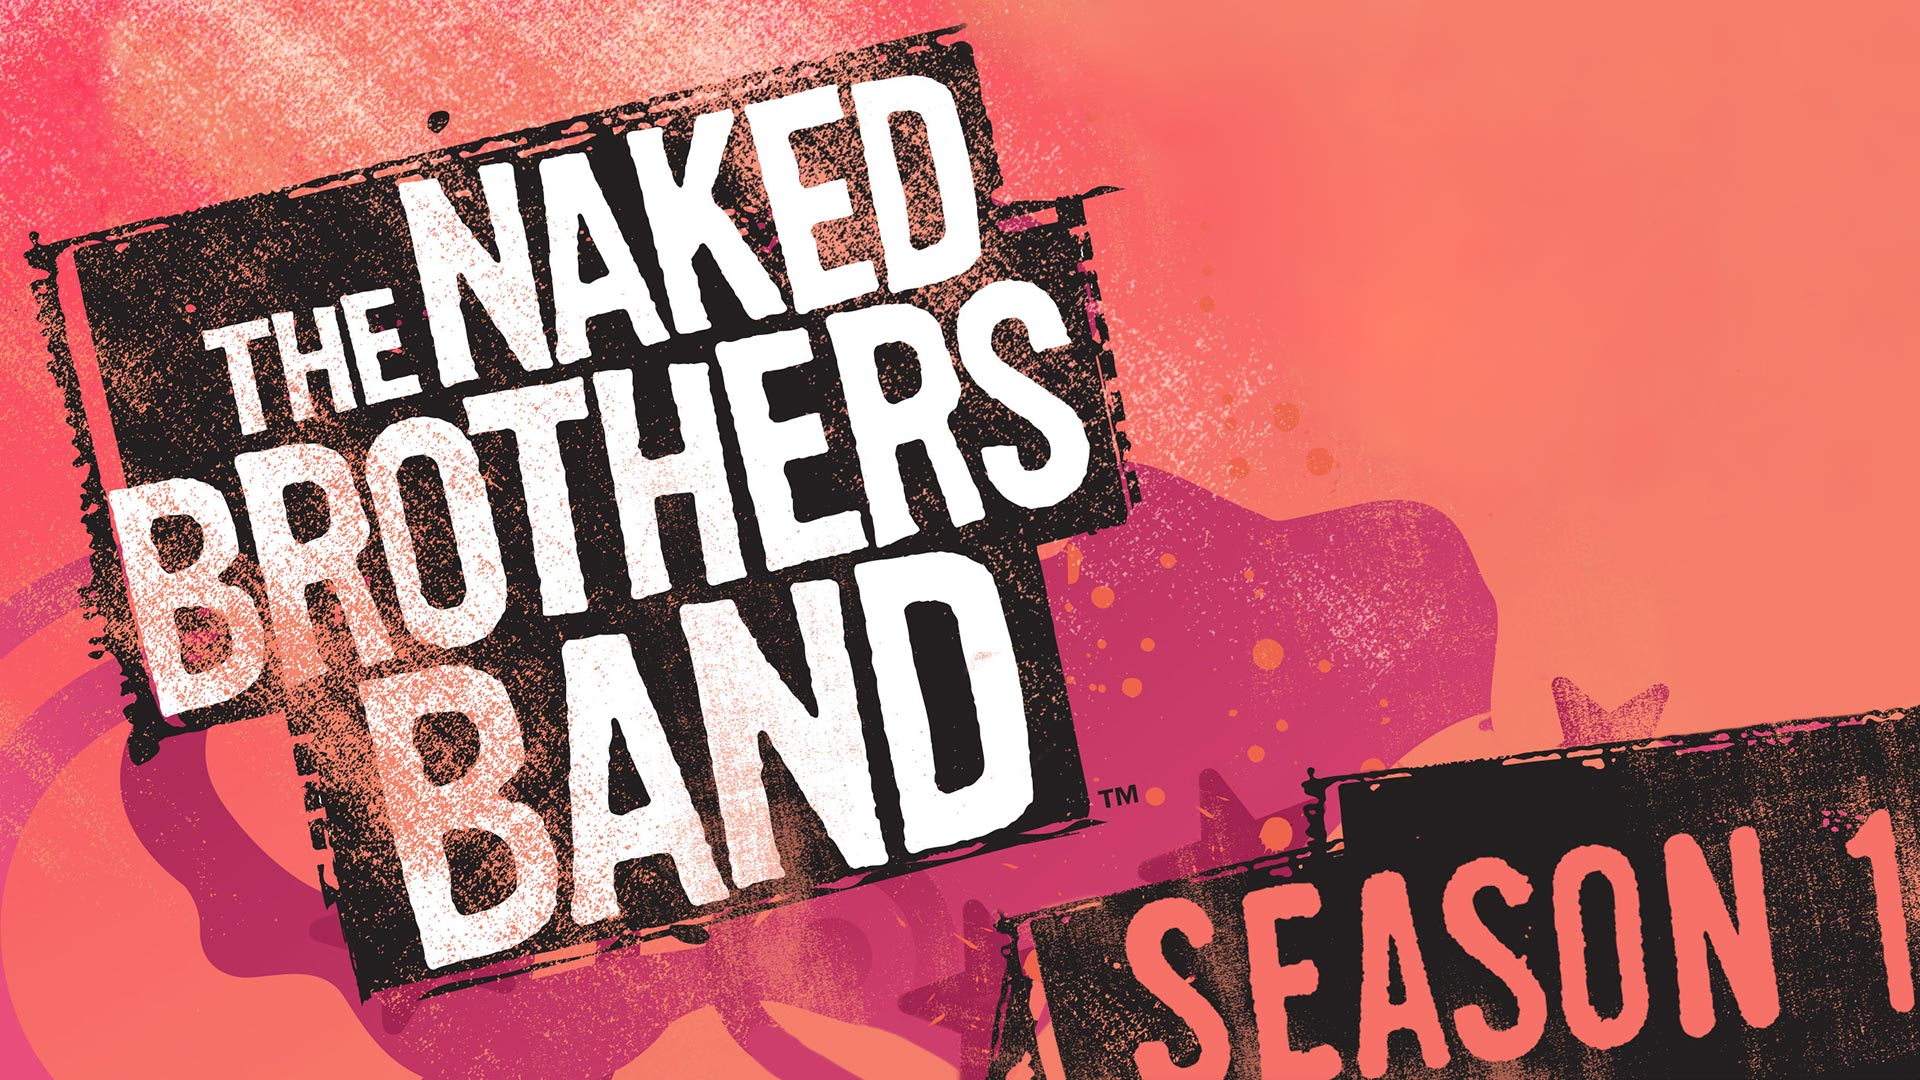 The Naked Brothers Band Season 1